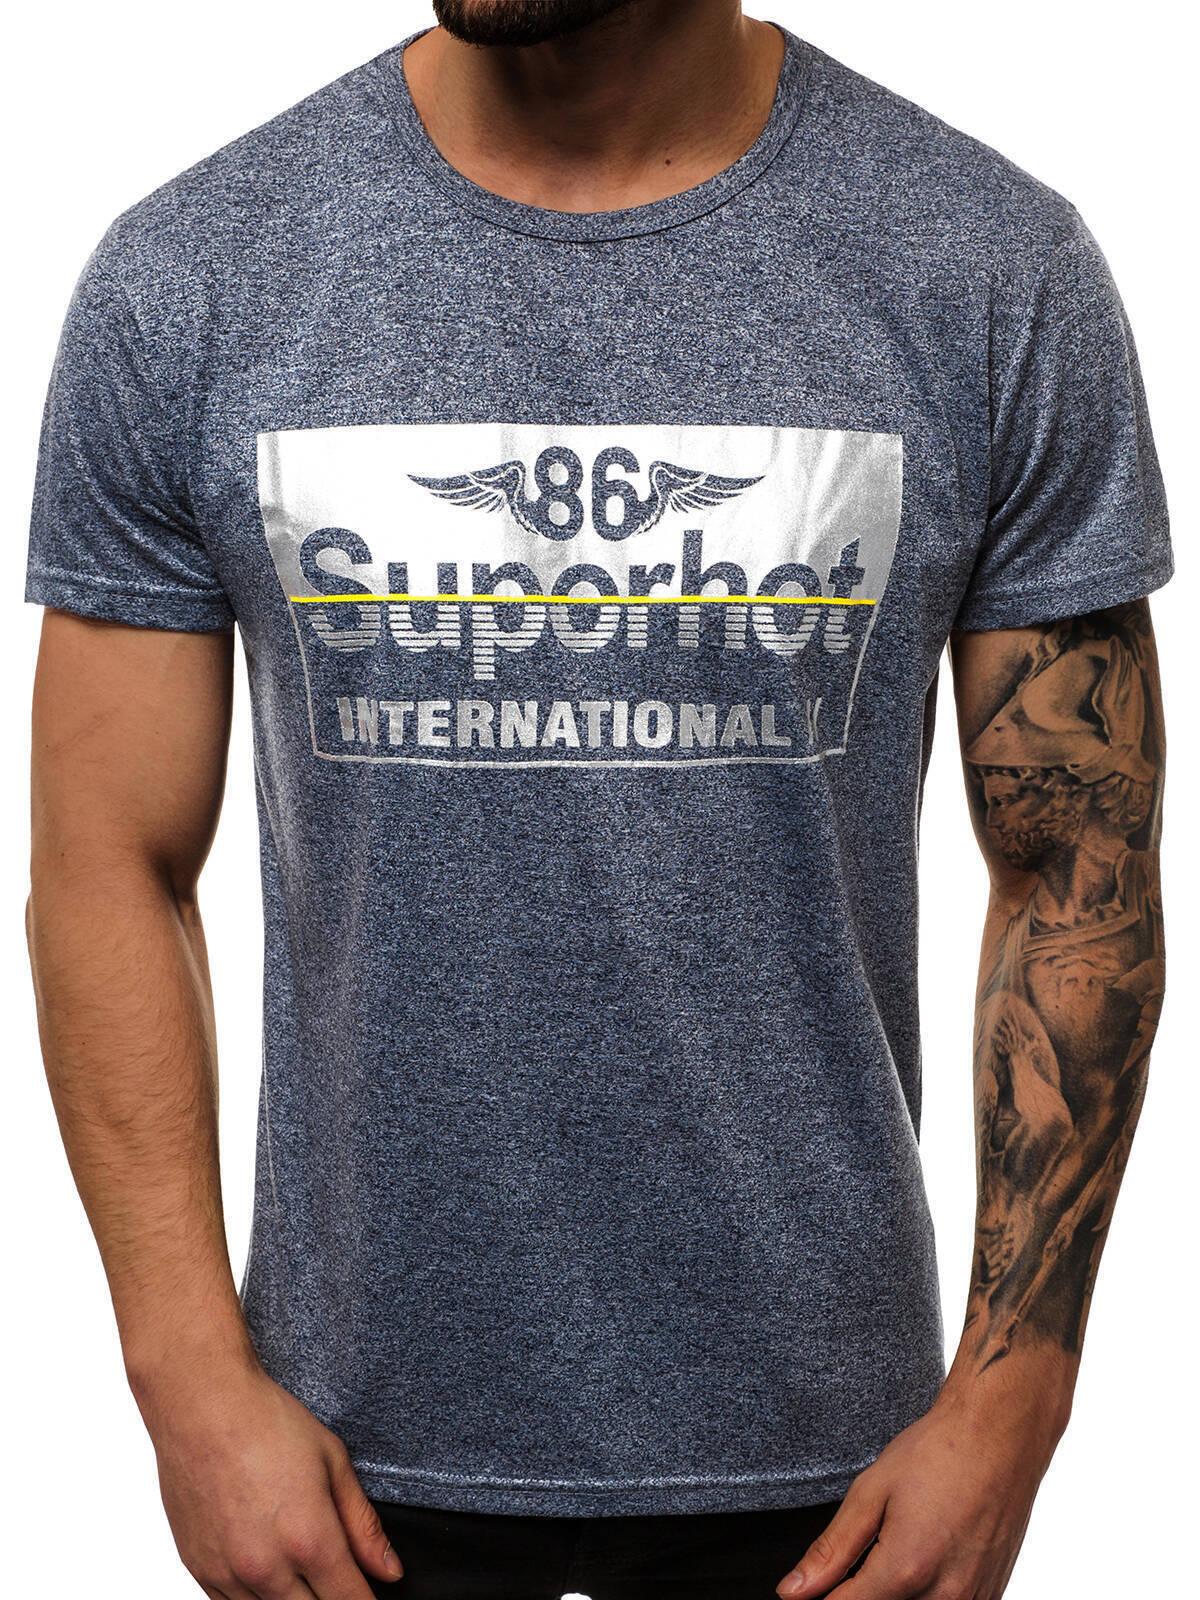 Indexbild 55 - T-Shirt Kurzarm Print Aufdruck Fitness Jogging Sport Shirt Herren OZONEE 12511